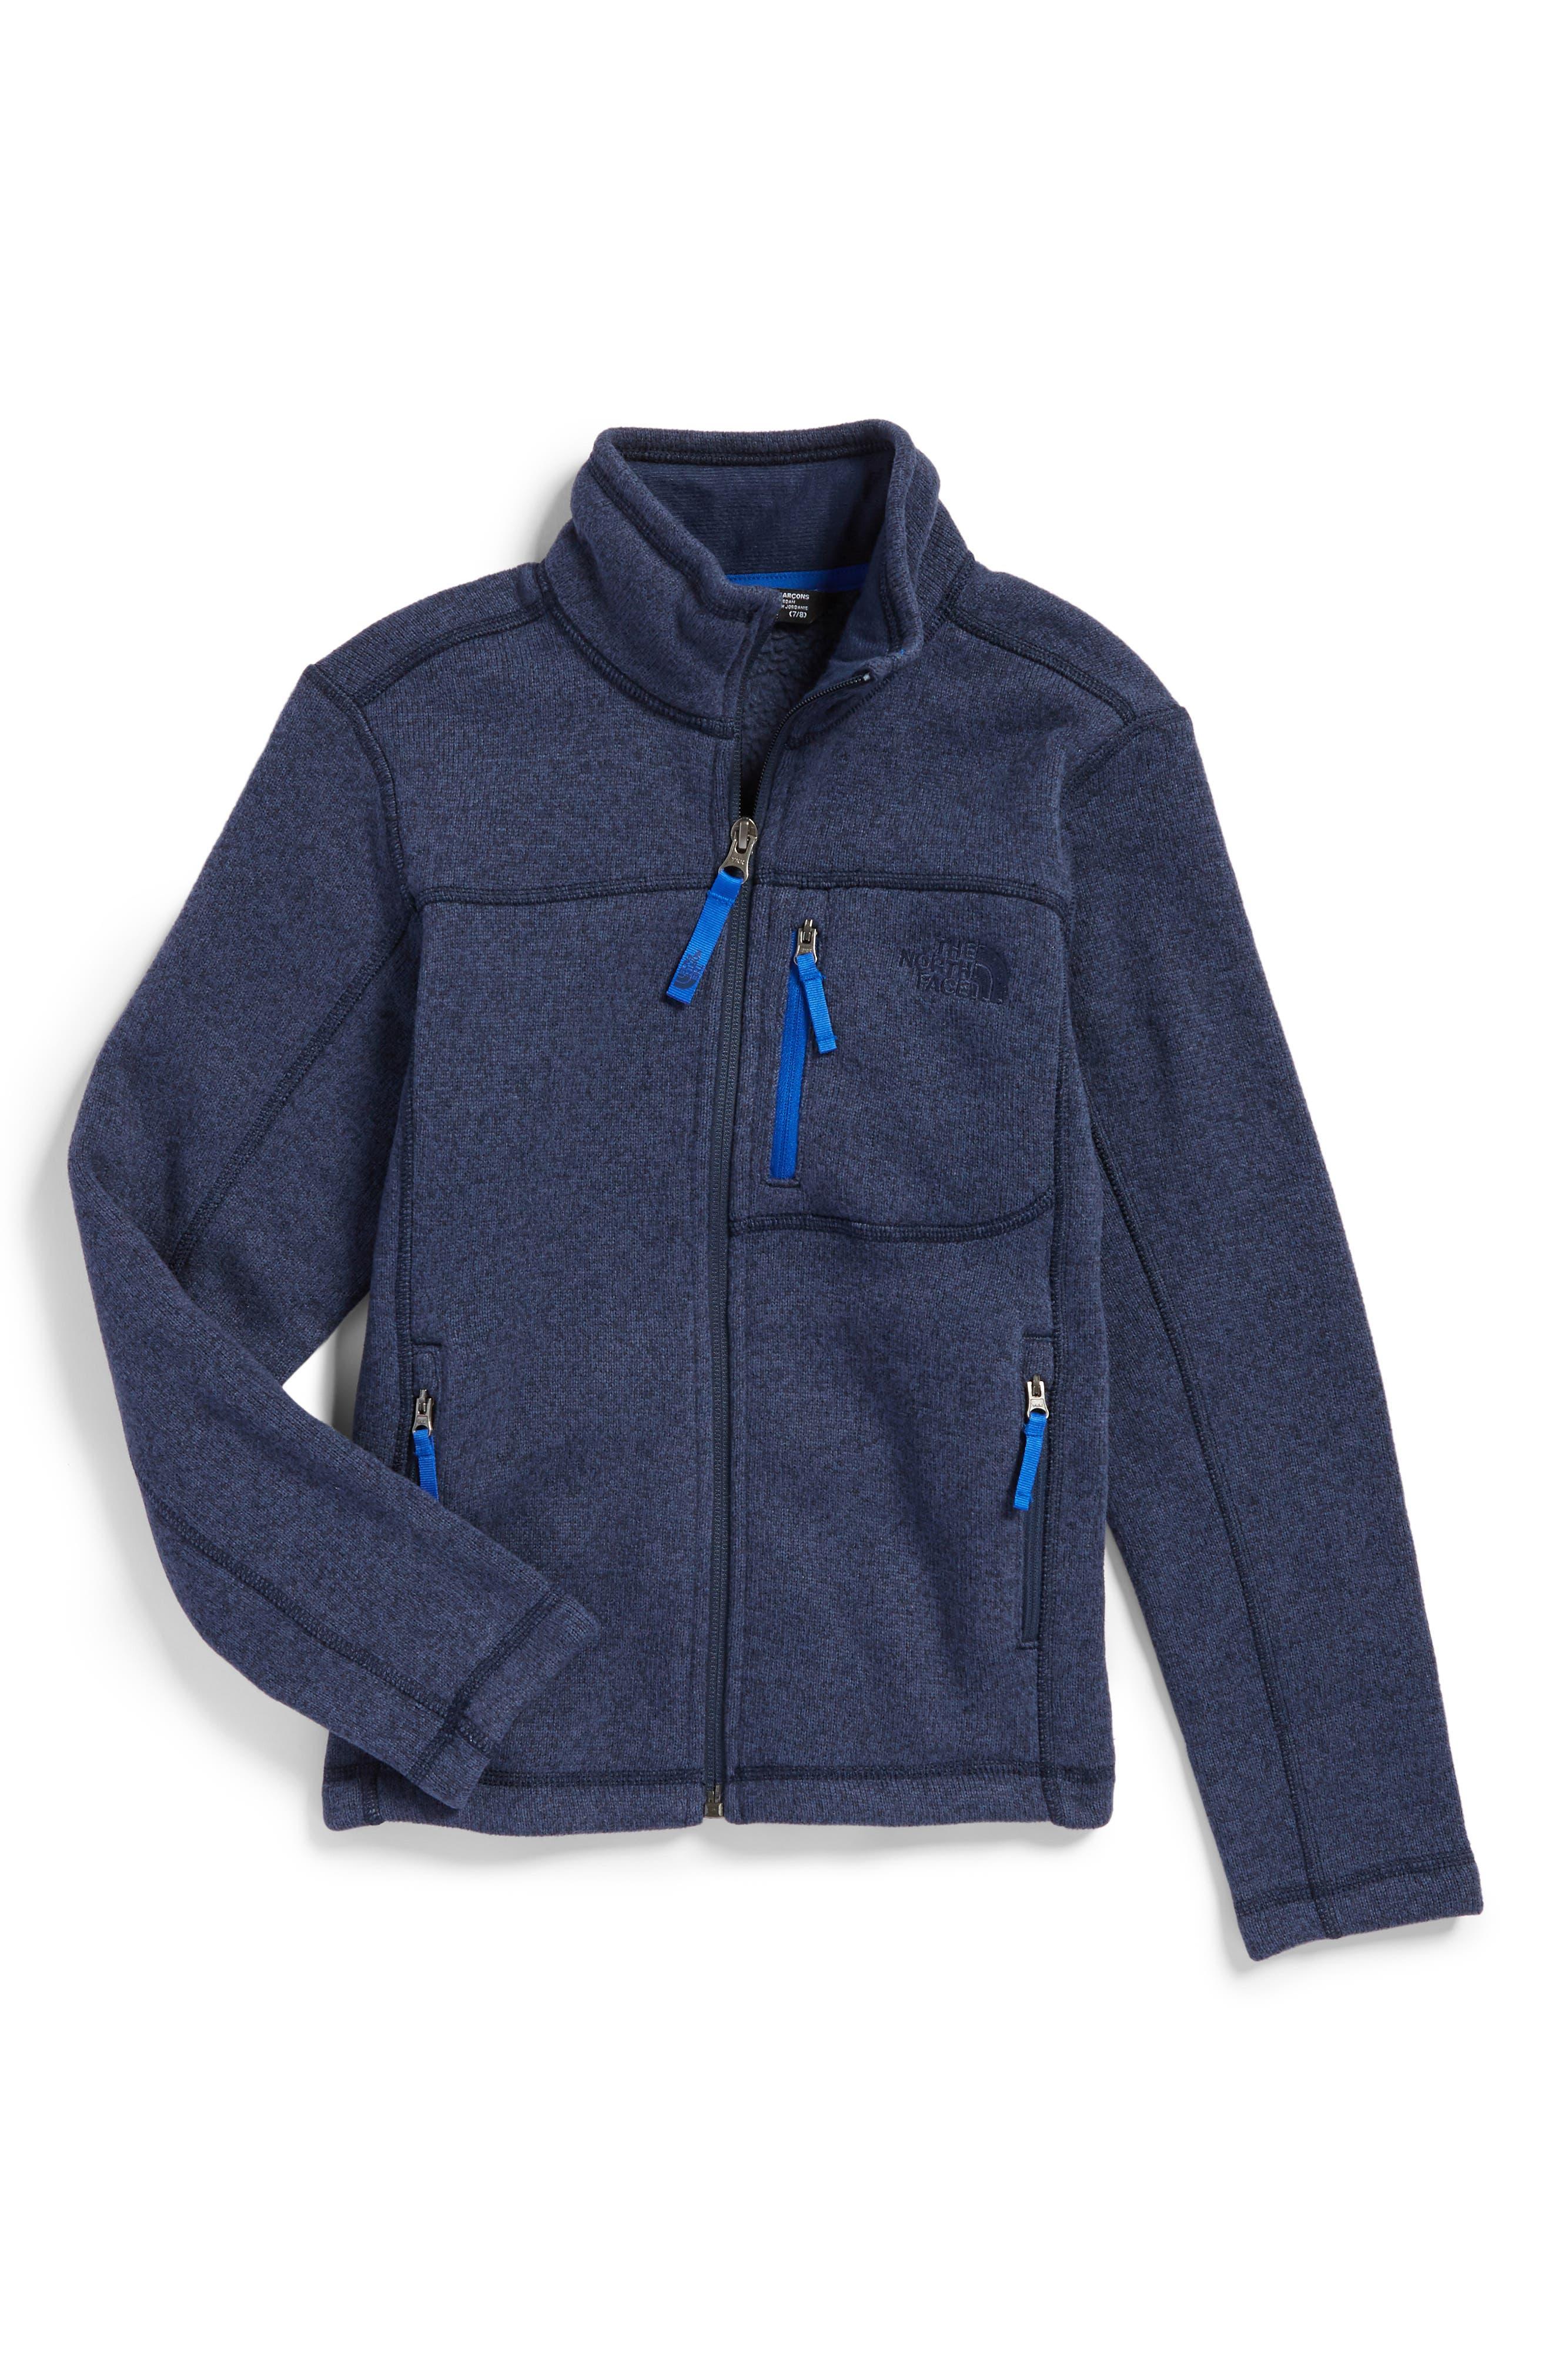 Gordon Lyons Sweater Fleece Zip Jacket,                             Main thumbnail 9, color,